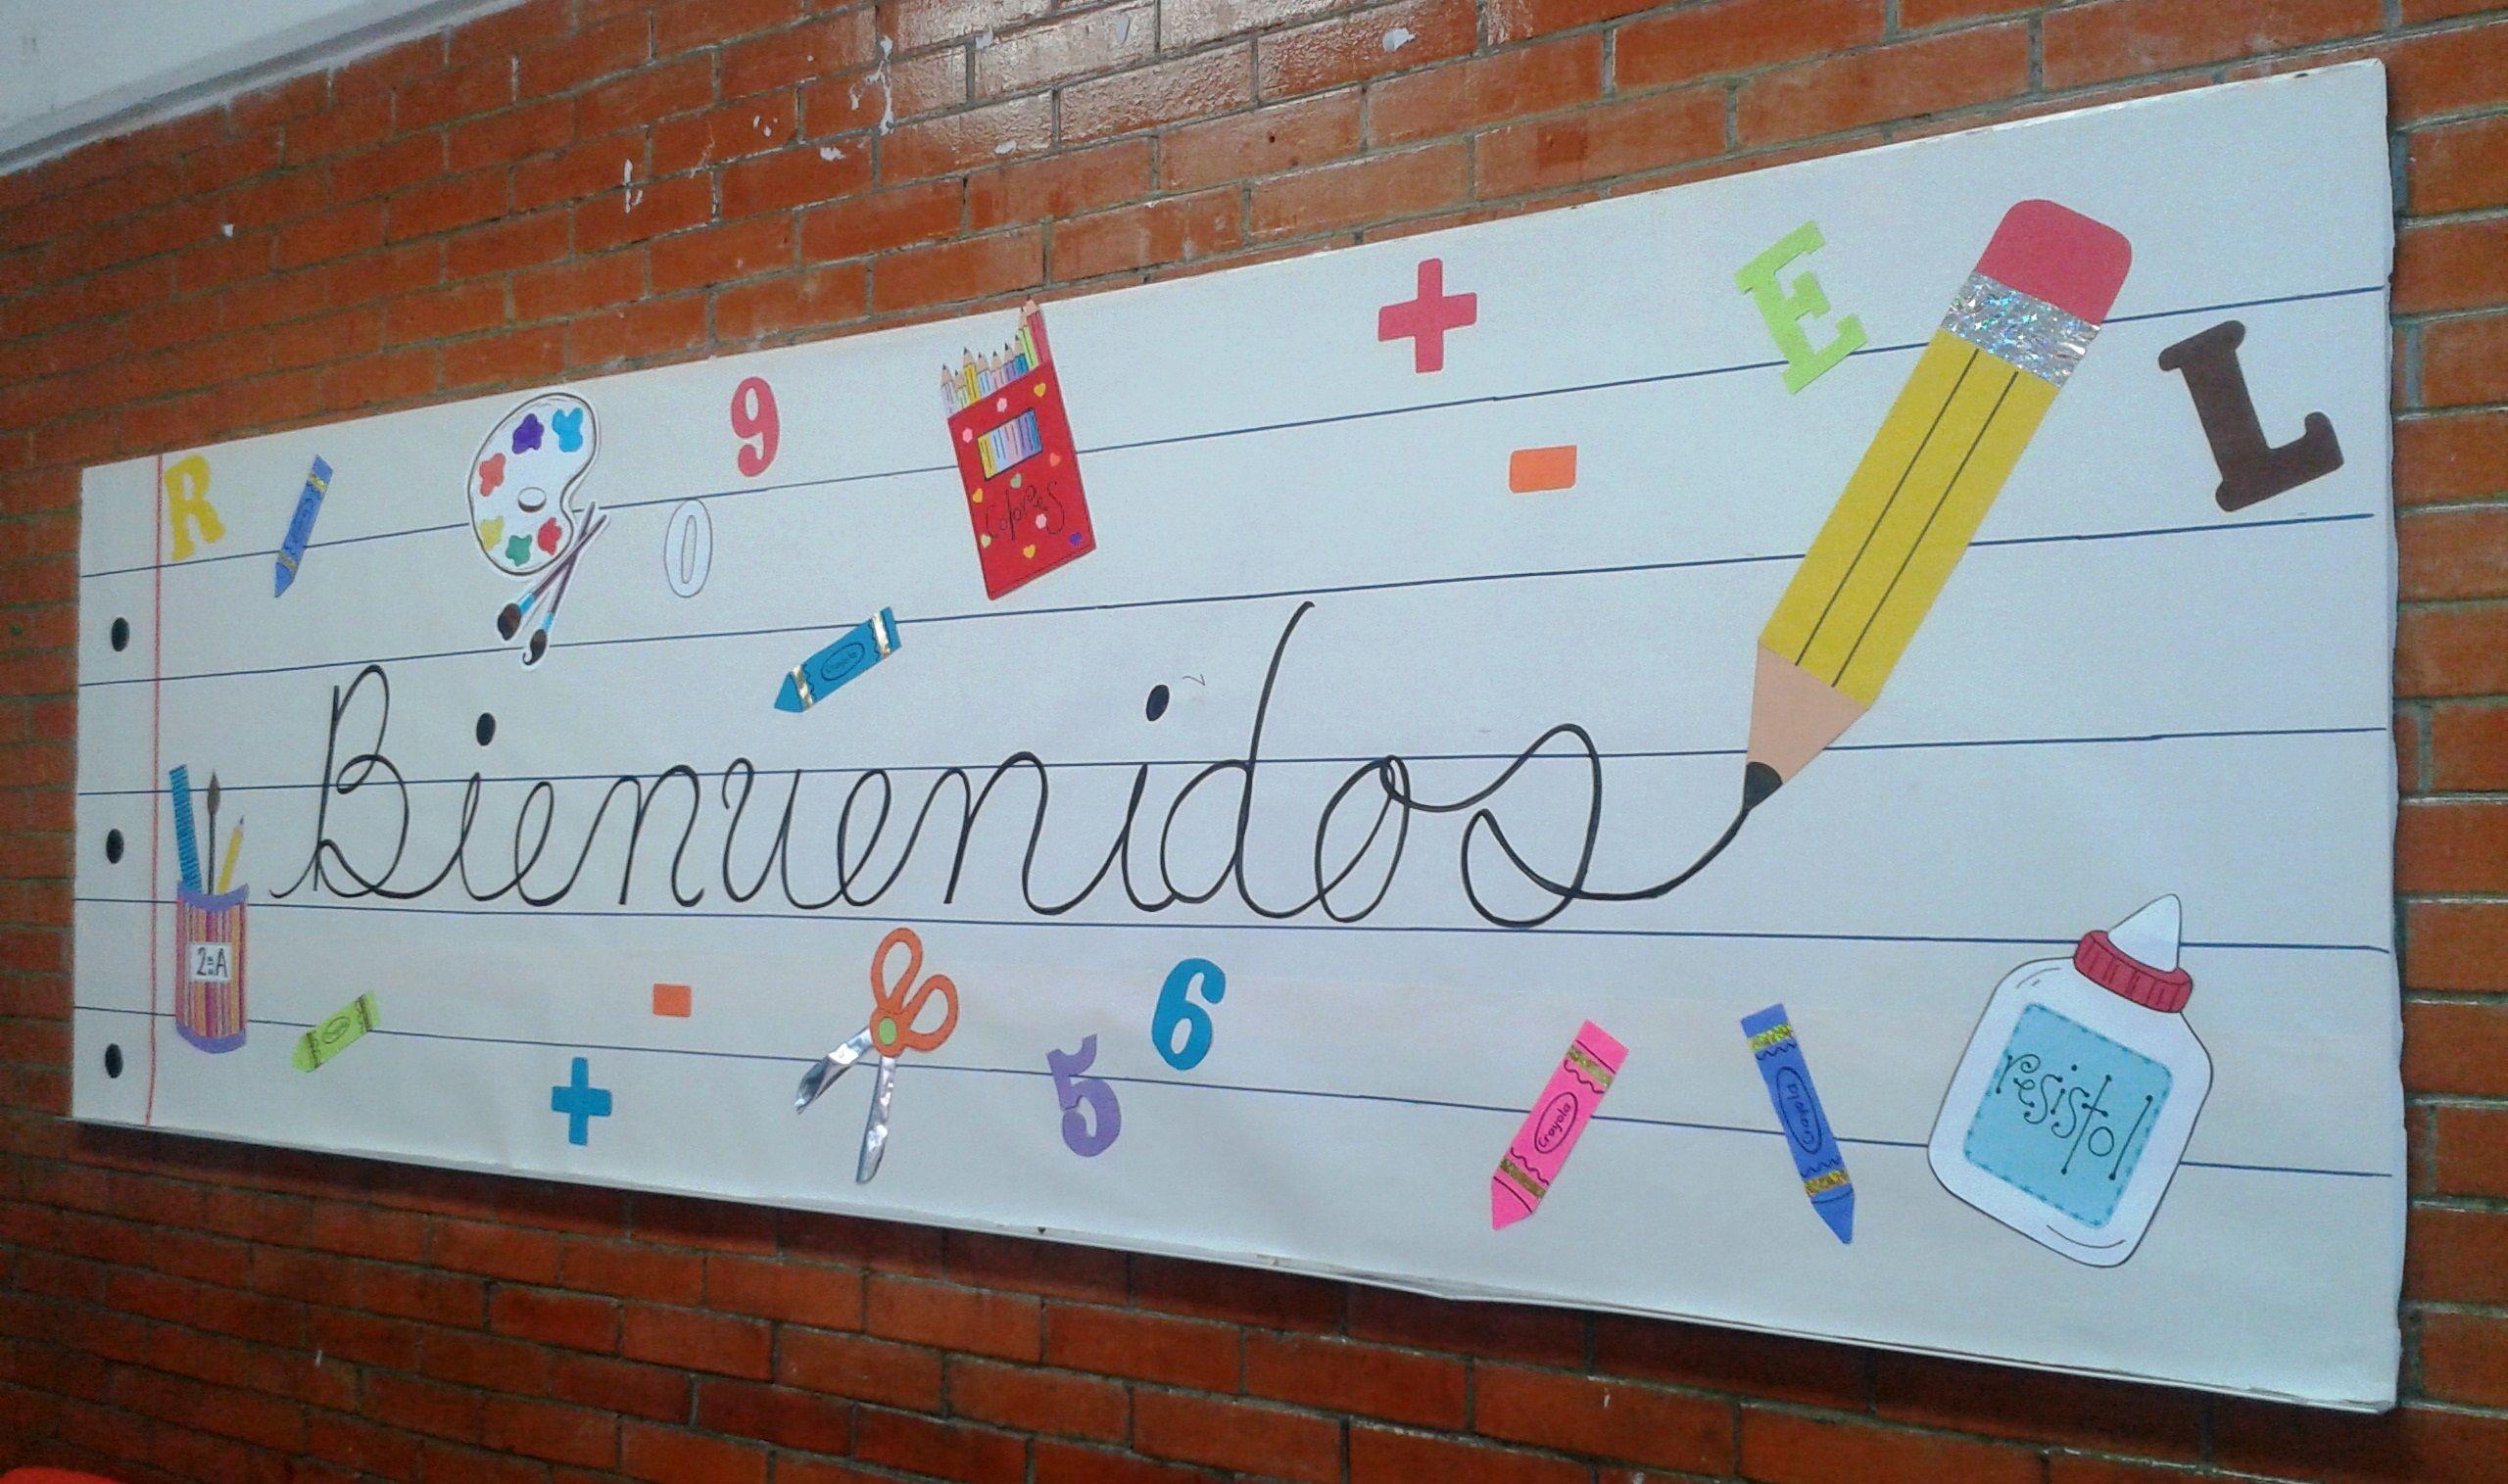 Calendario Escolar Bilbao 2019 Actual Periodico Mural Regreso A Clases Cole Of Calendario Escolar Bilbao 2019 Más Actual El Mundo 23 03 2018